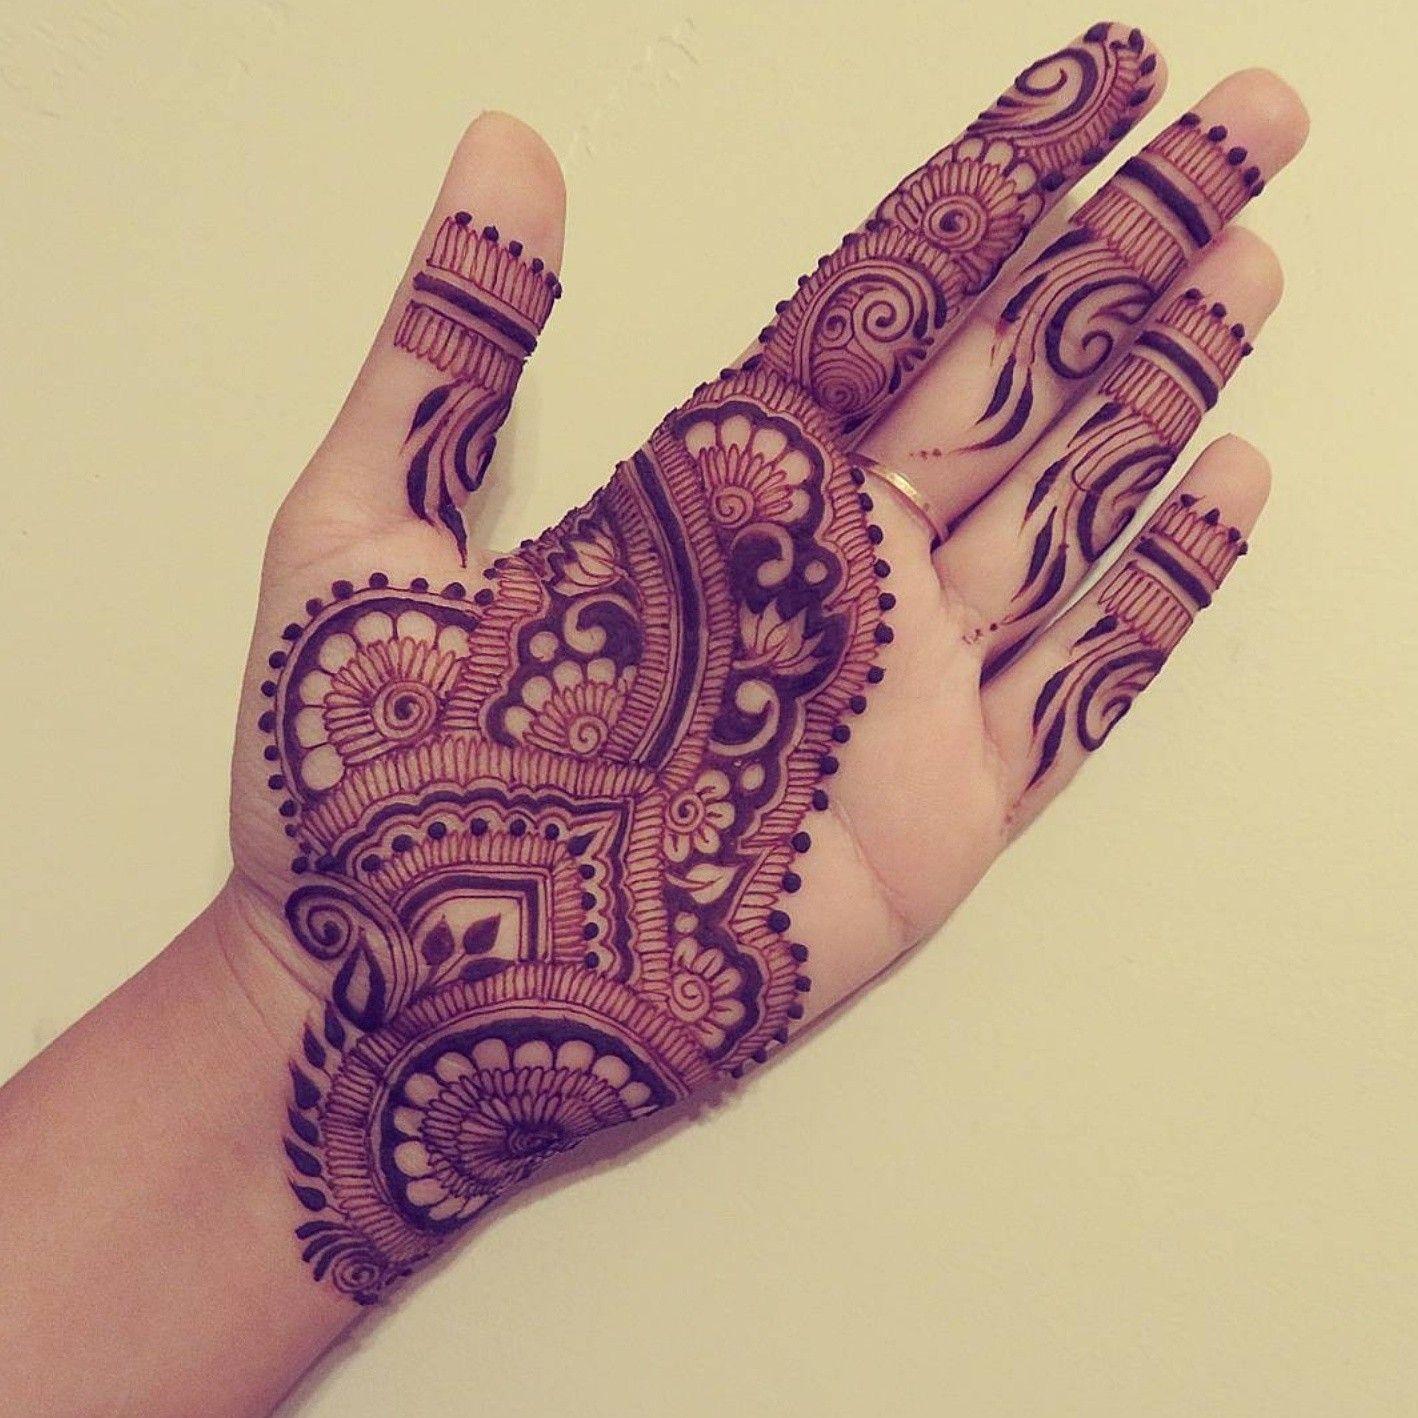 Henna Hands, Palms & Feet |Simple Henna Palm Designs